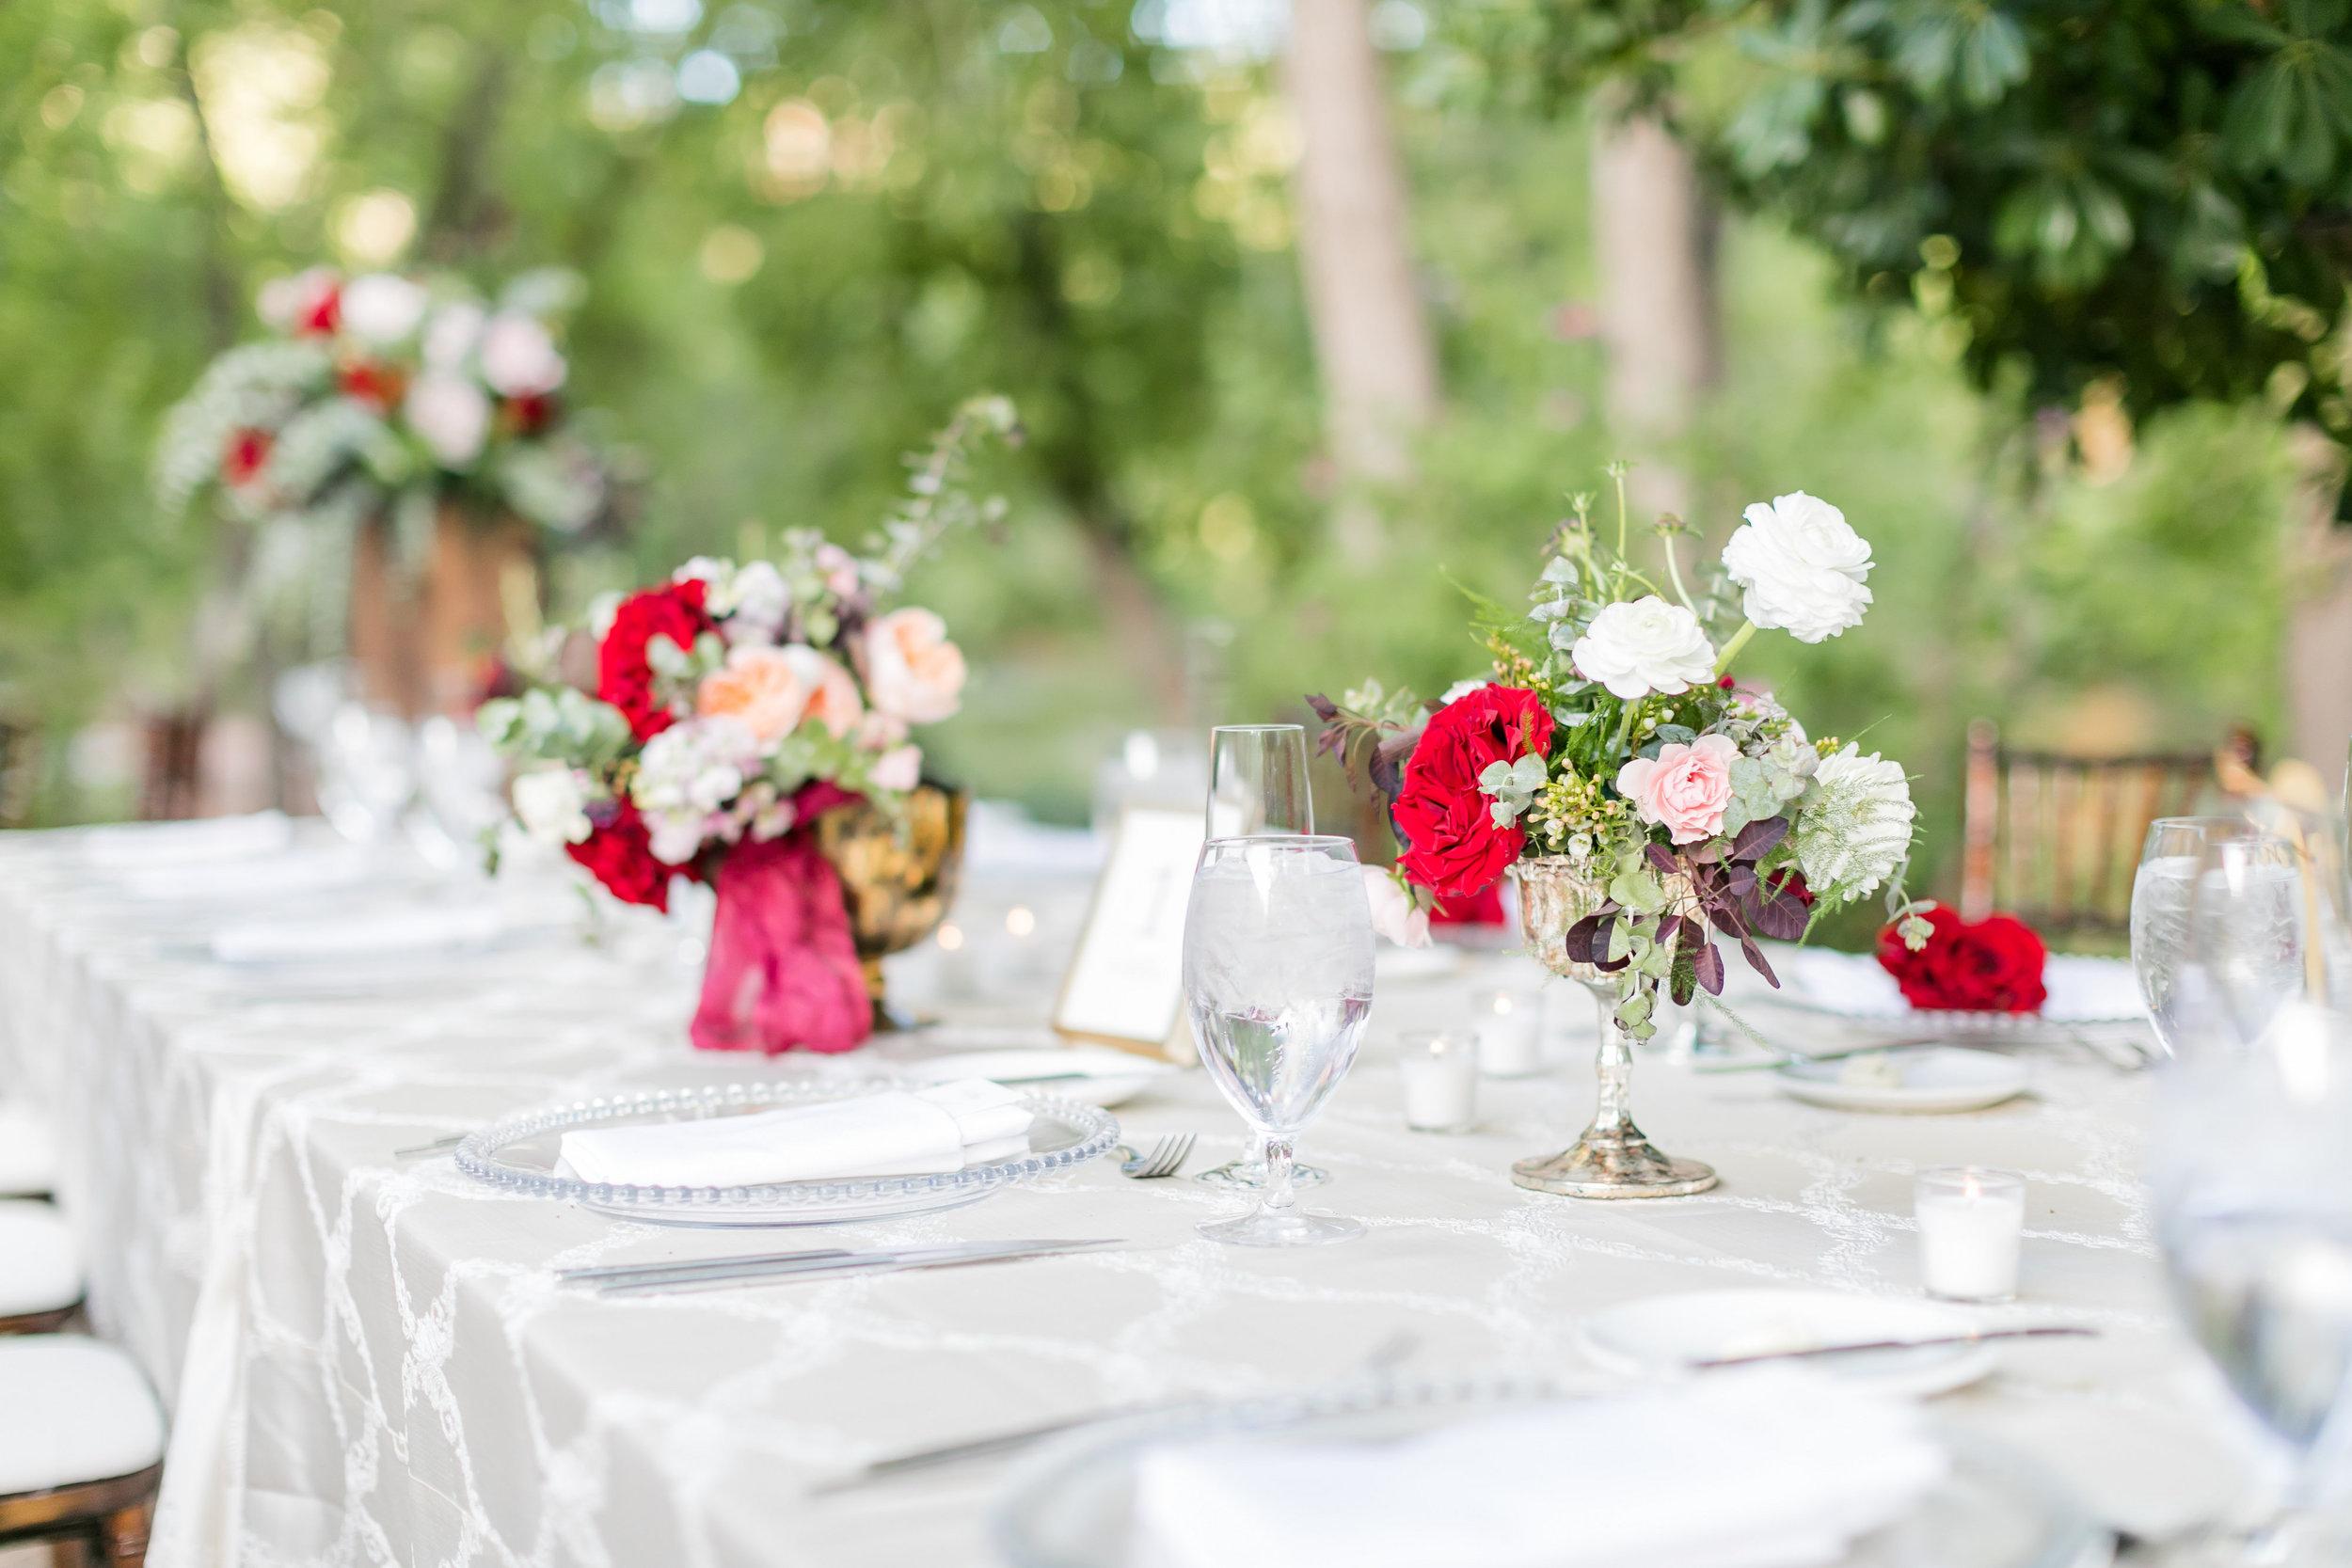 Burgundy and Blush Wedding at L'Auberge de Sedona